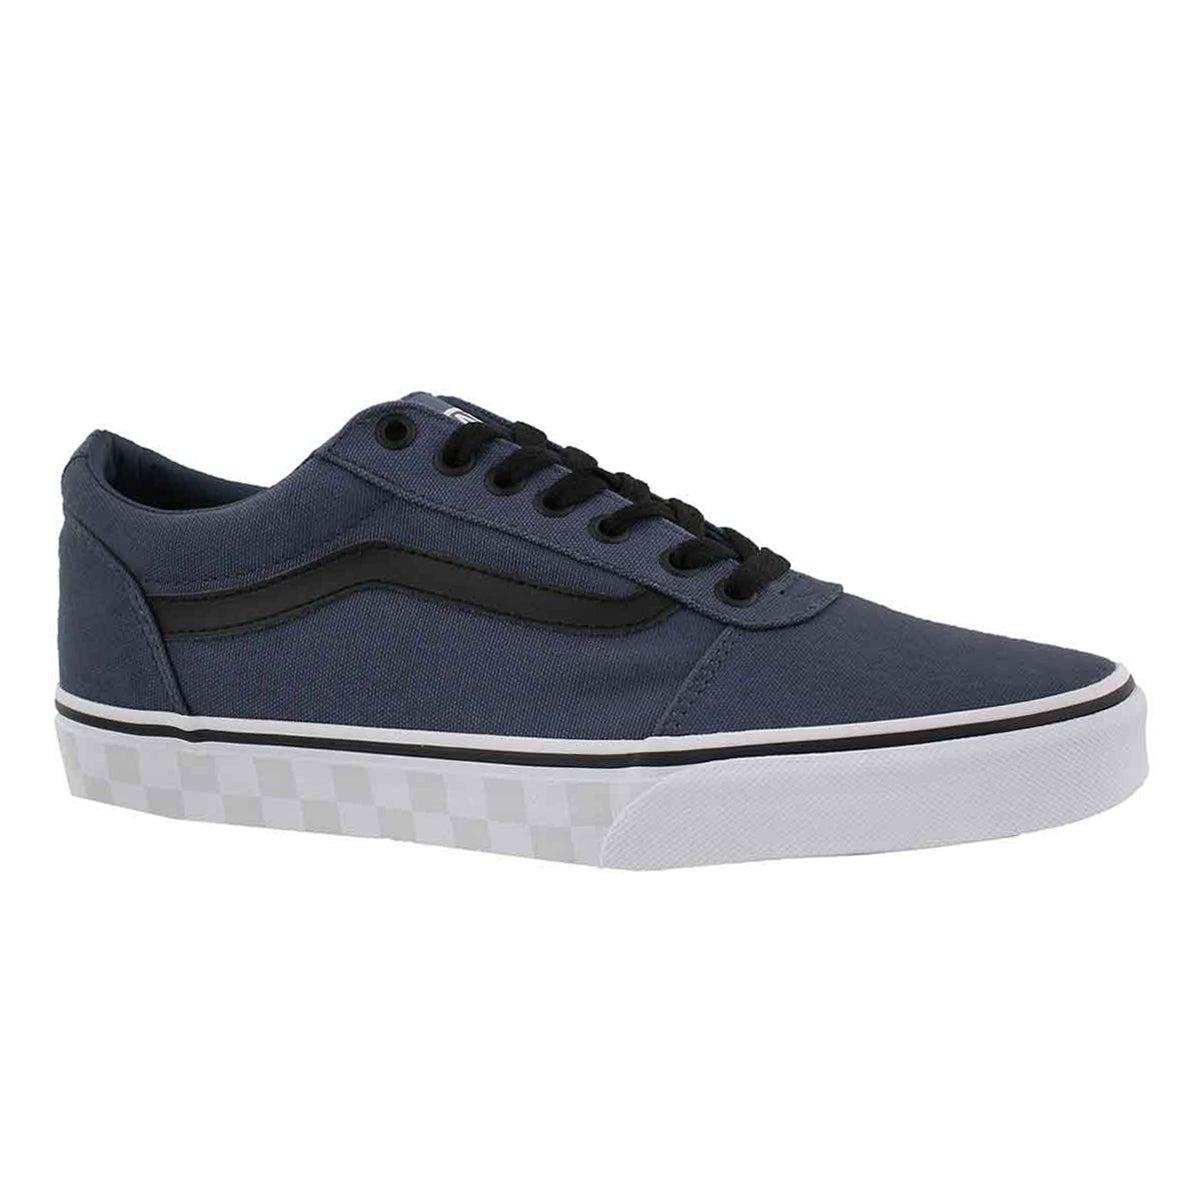 Men's WARD vIntage indigo/wht lace up sneaker